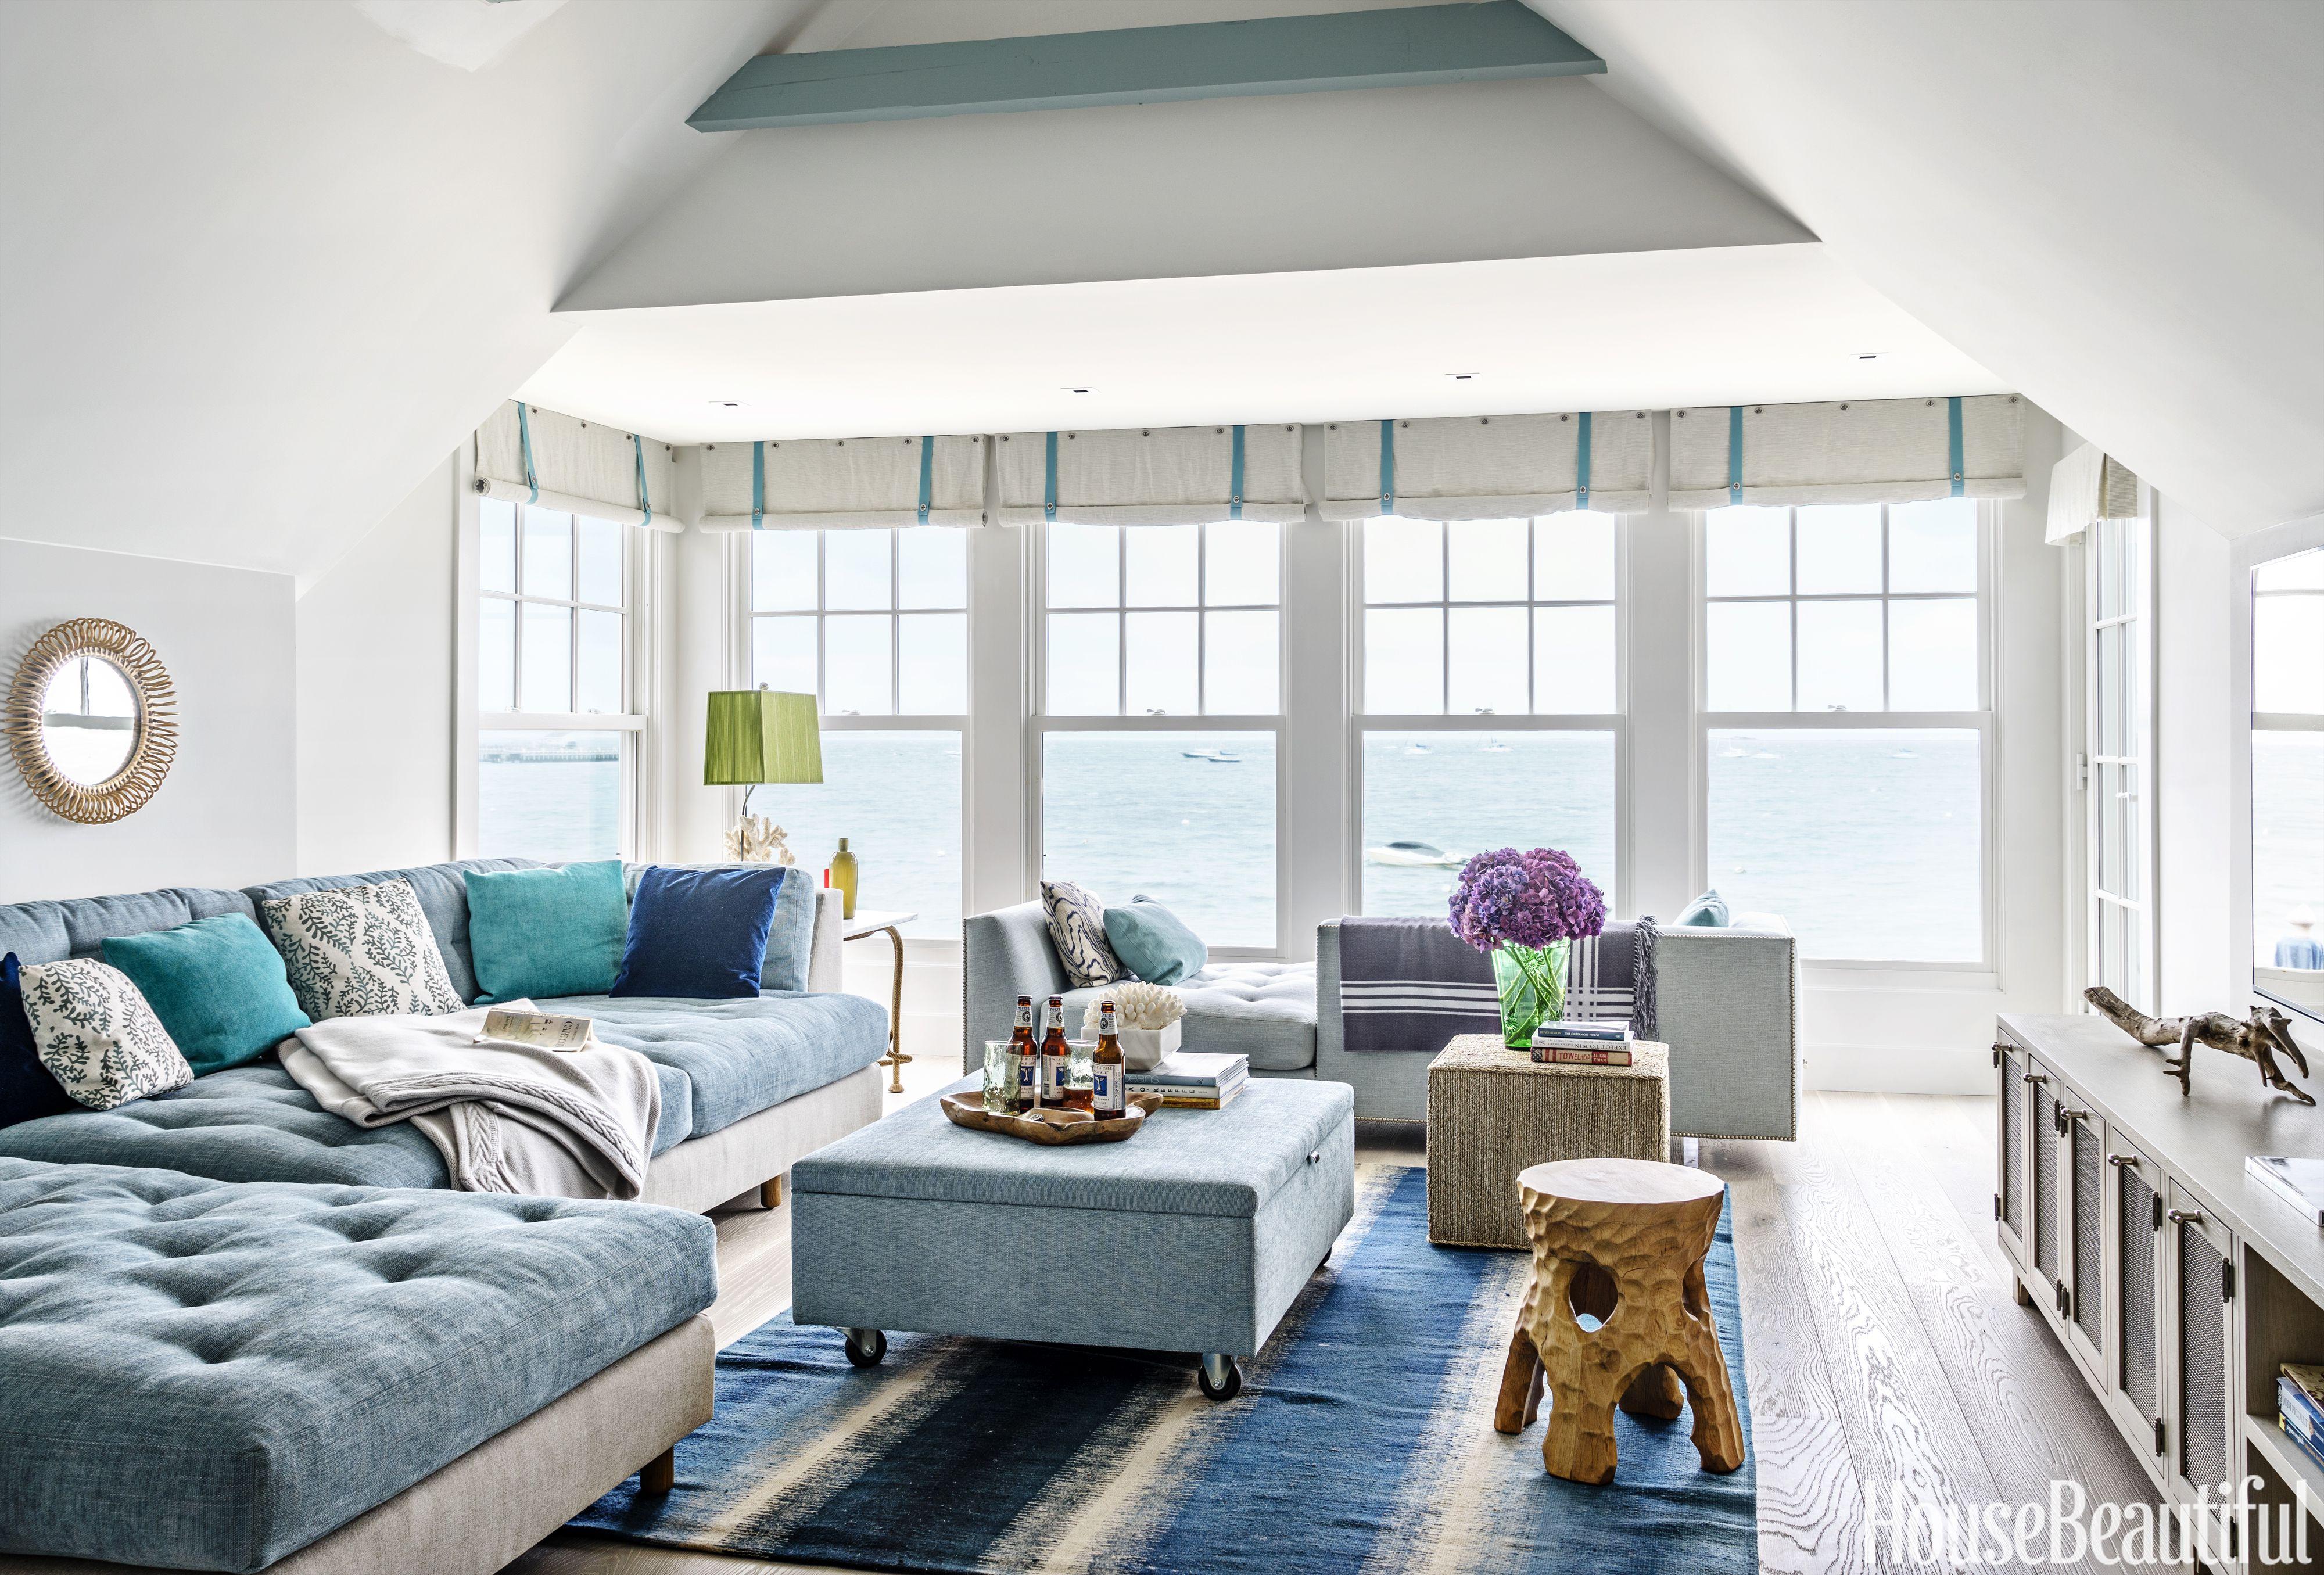 Living Room Design 70 Best Living Room Decorating Ideas & Designs - housebeautiful.com IAWWRFQ